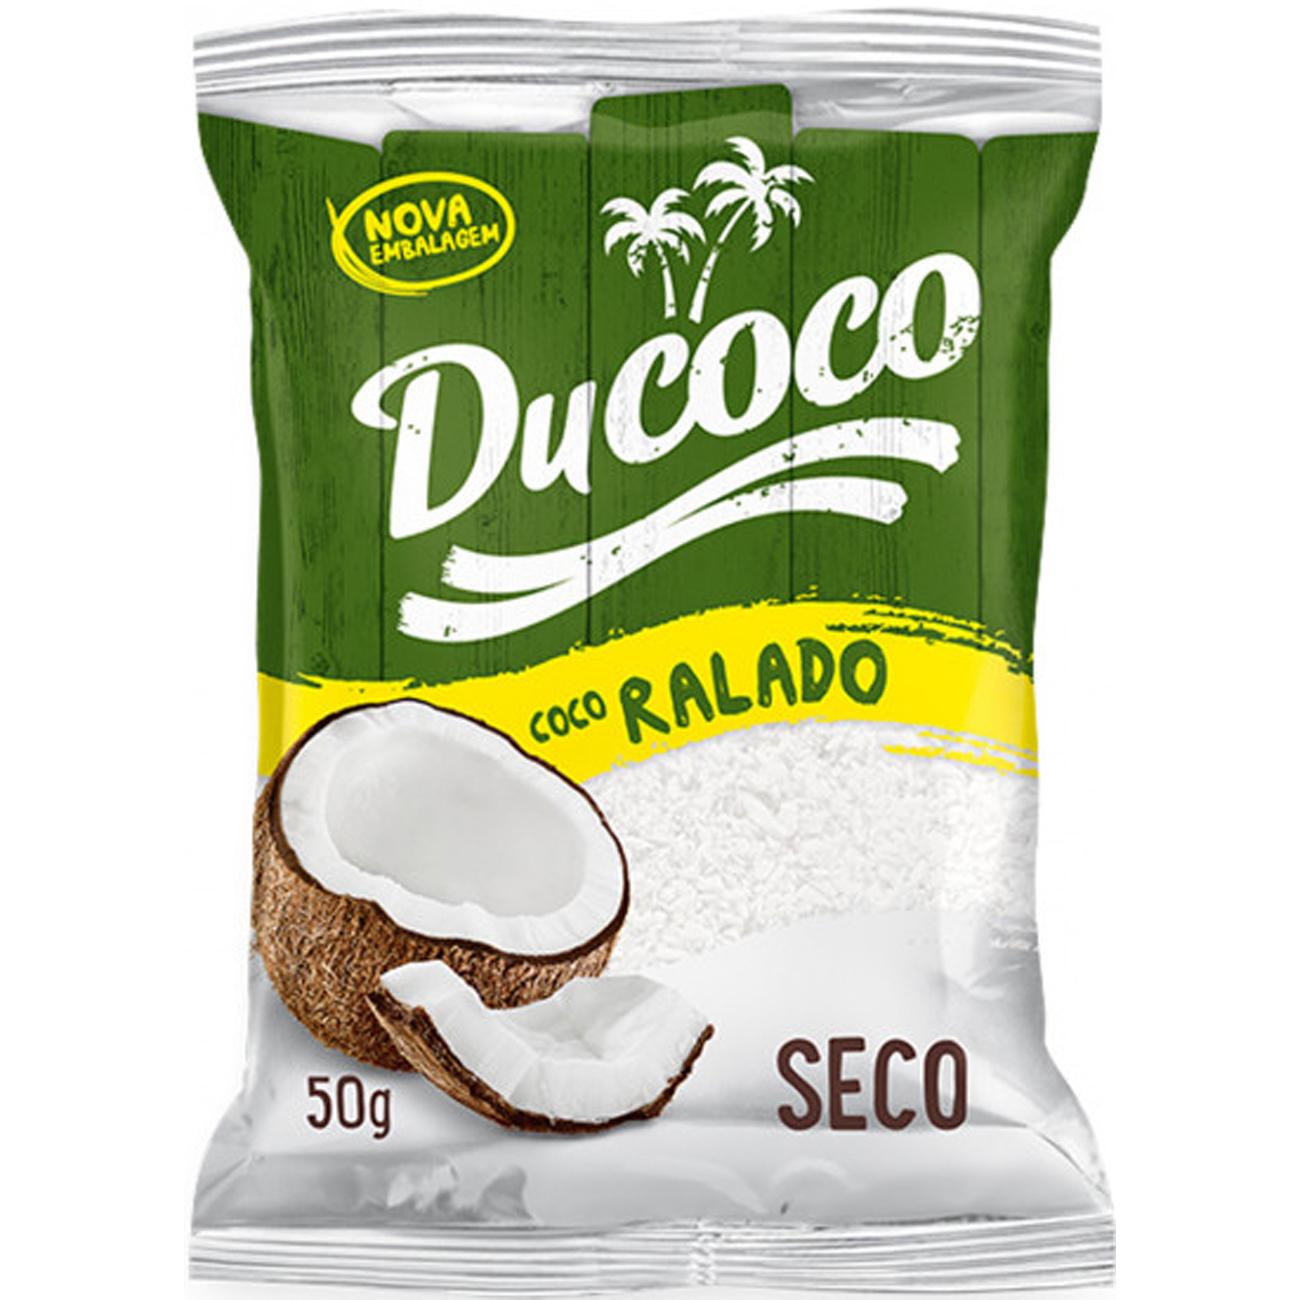 COCO RALADO DUCOCO SECO 50G